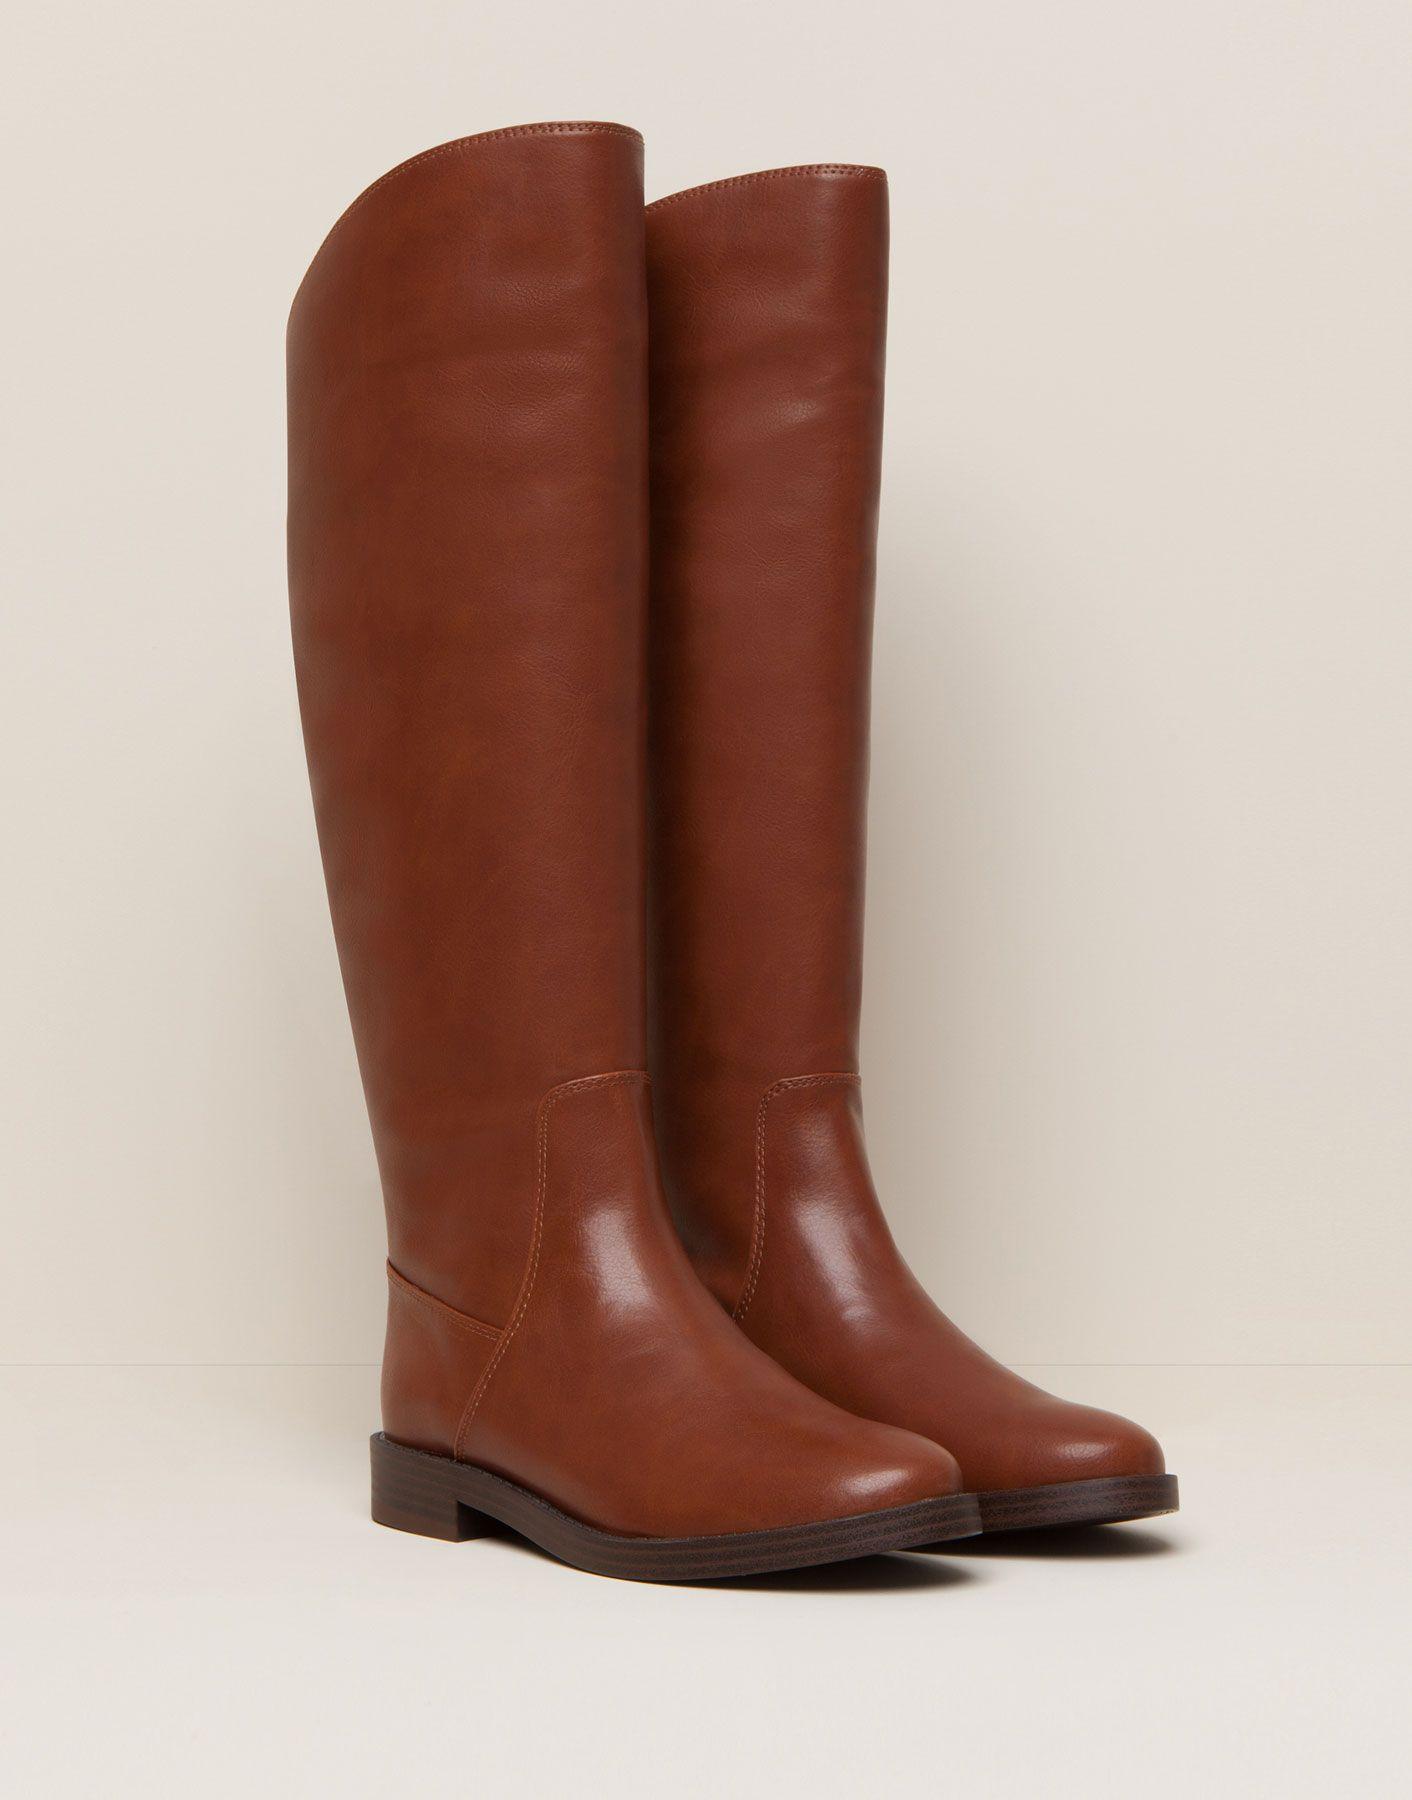 Zip Up Boots Women S Footwear Woman Pull Bear Turkey Boots Shoe Boots Womens Boots